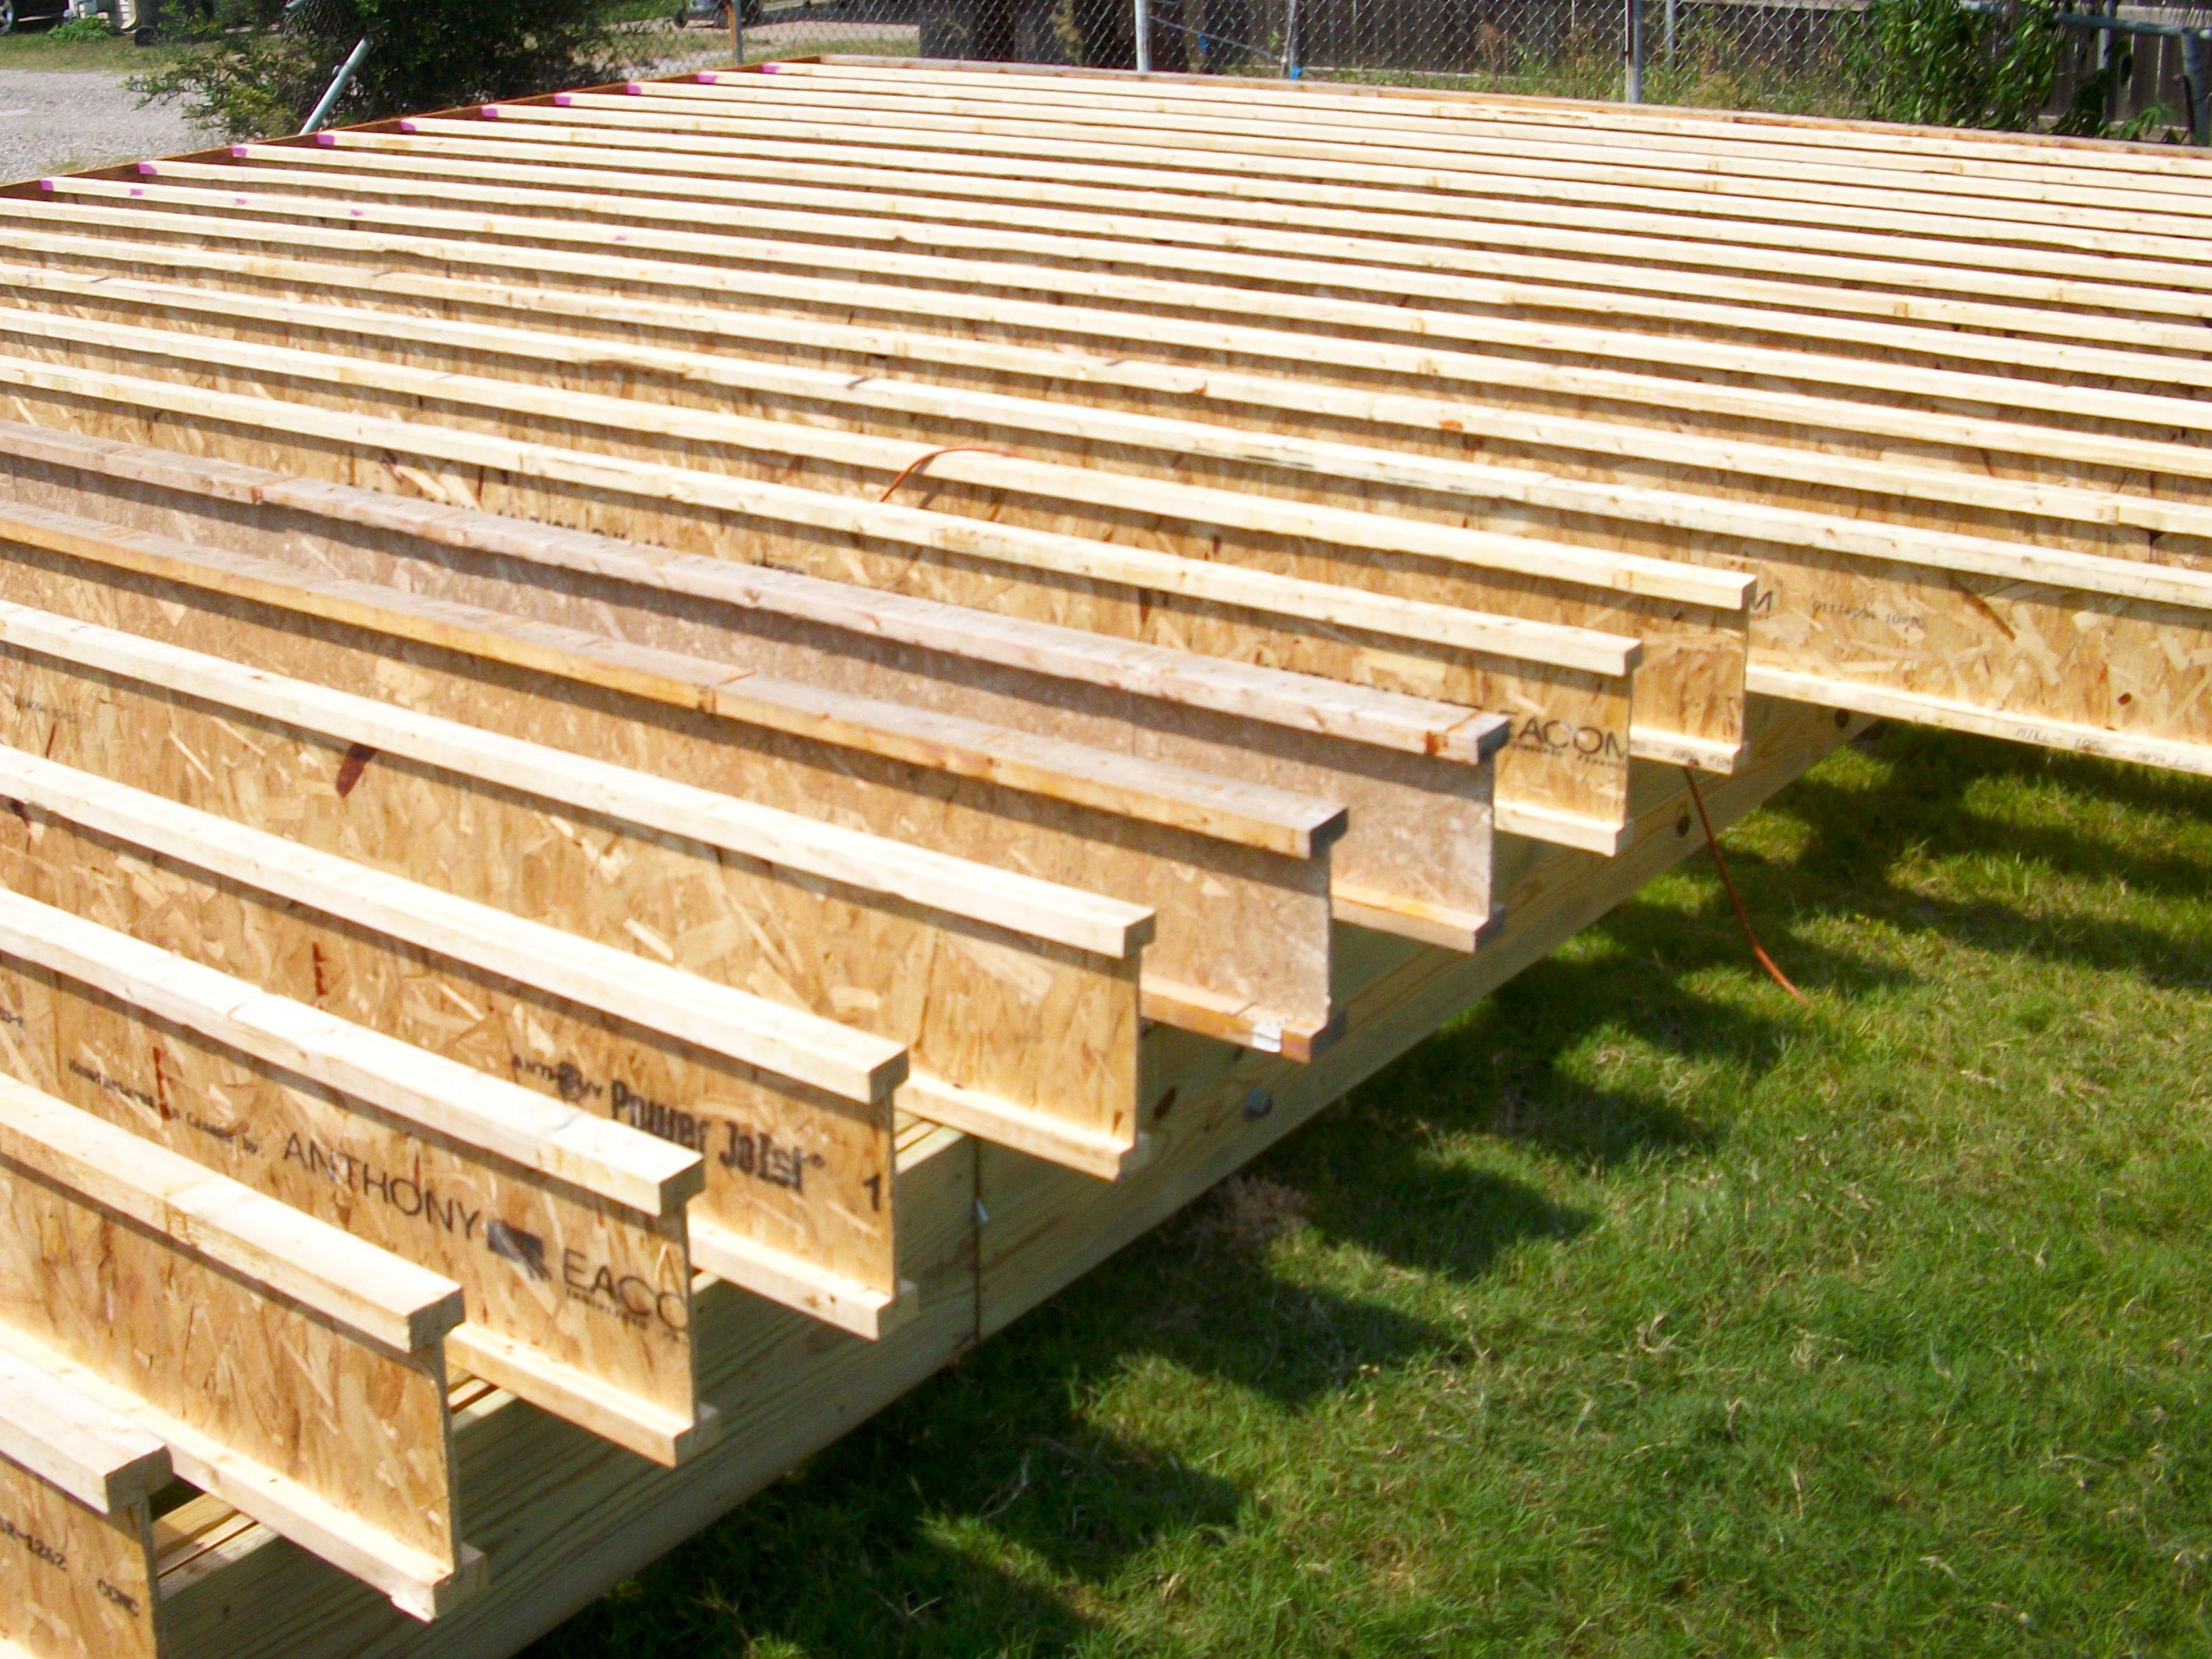 Diy How To Build Wood I Joist Download Dewalt Thickness